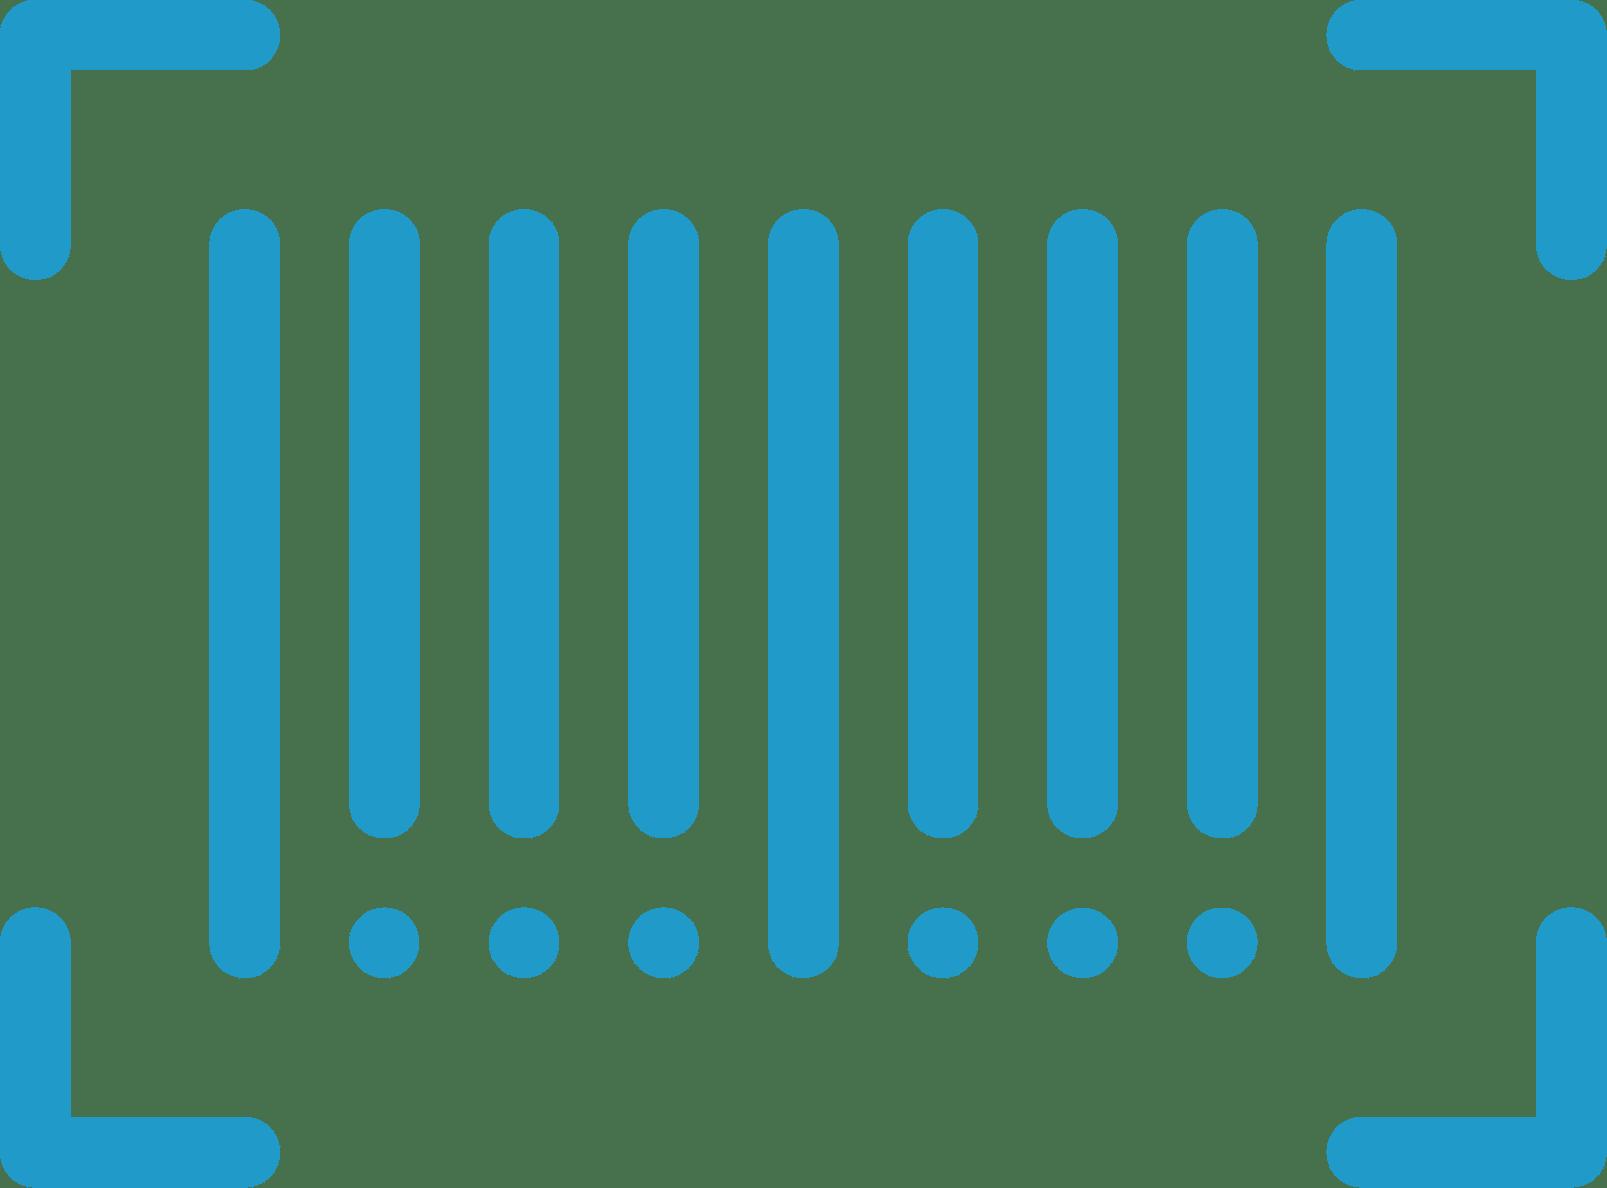 Caracteríisticas tipos de campos avanzados